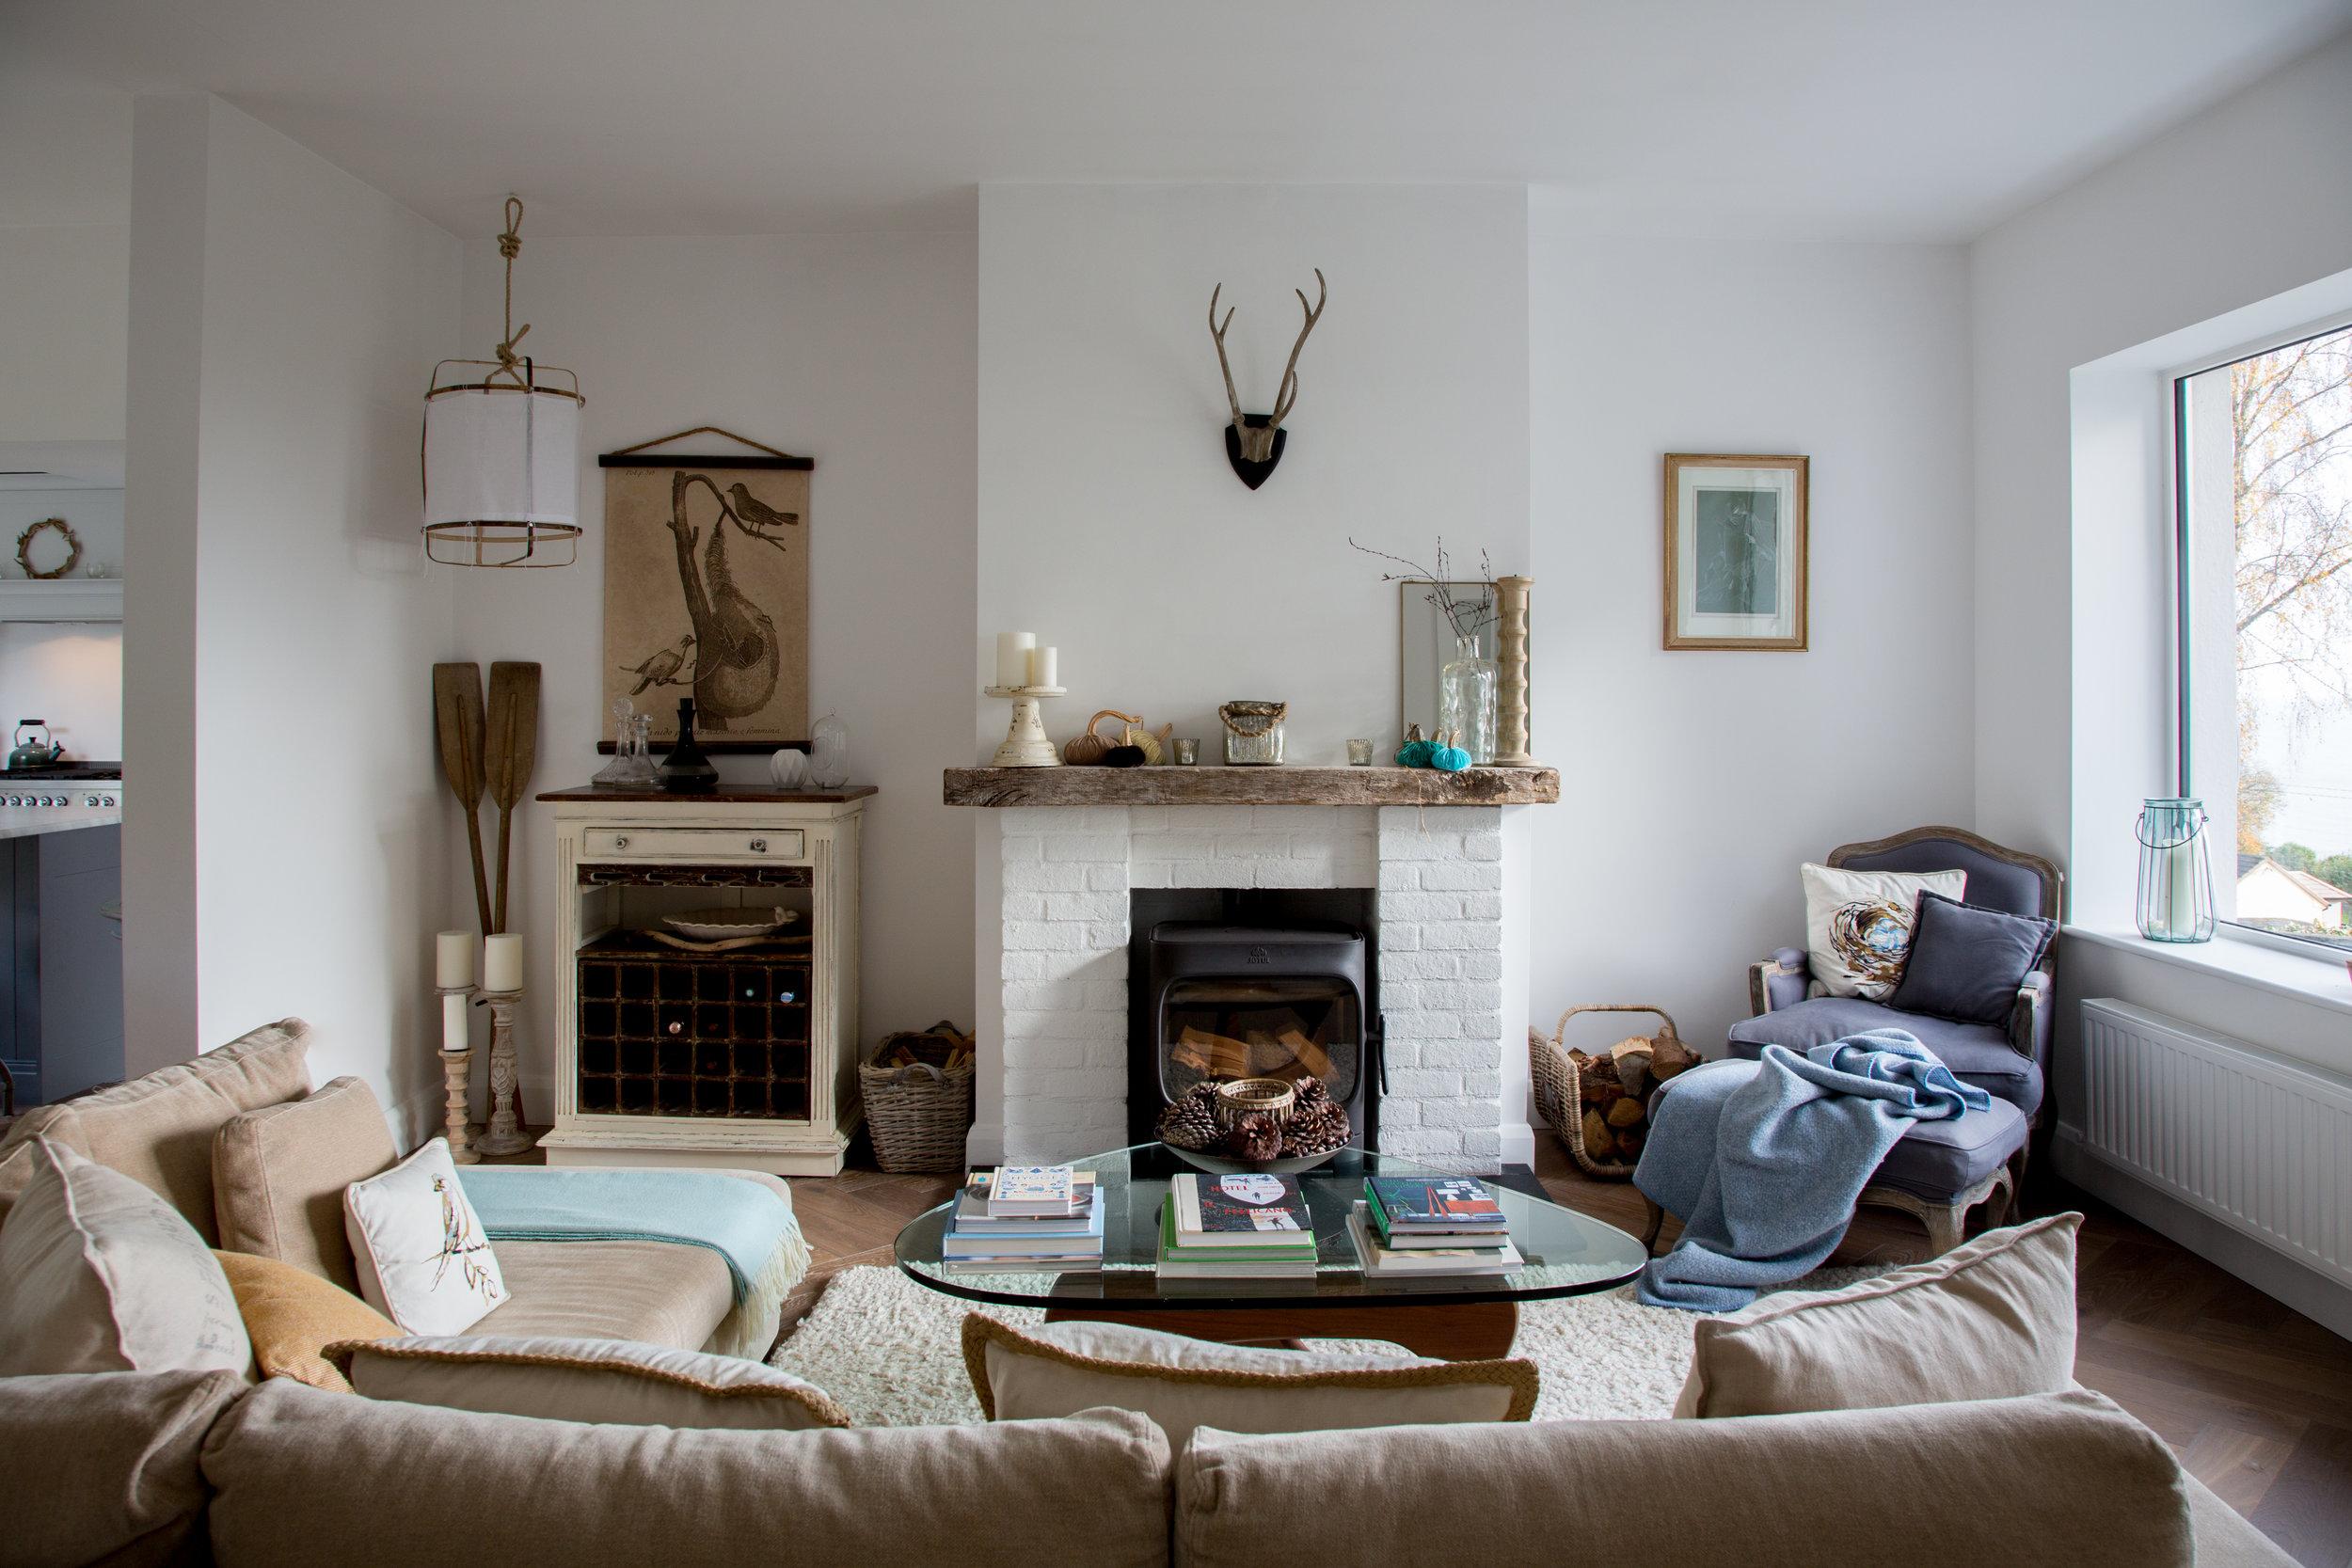 Lamb_Design_Paper_and_Moon_Emma_Lynch_Louise_Dockery_Scandi_French_Danish_homeware_Irish_business_interior_designer_Brittas_Bay_Wicklow_Ireland.jpg